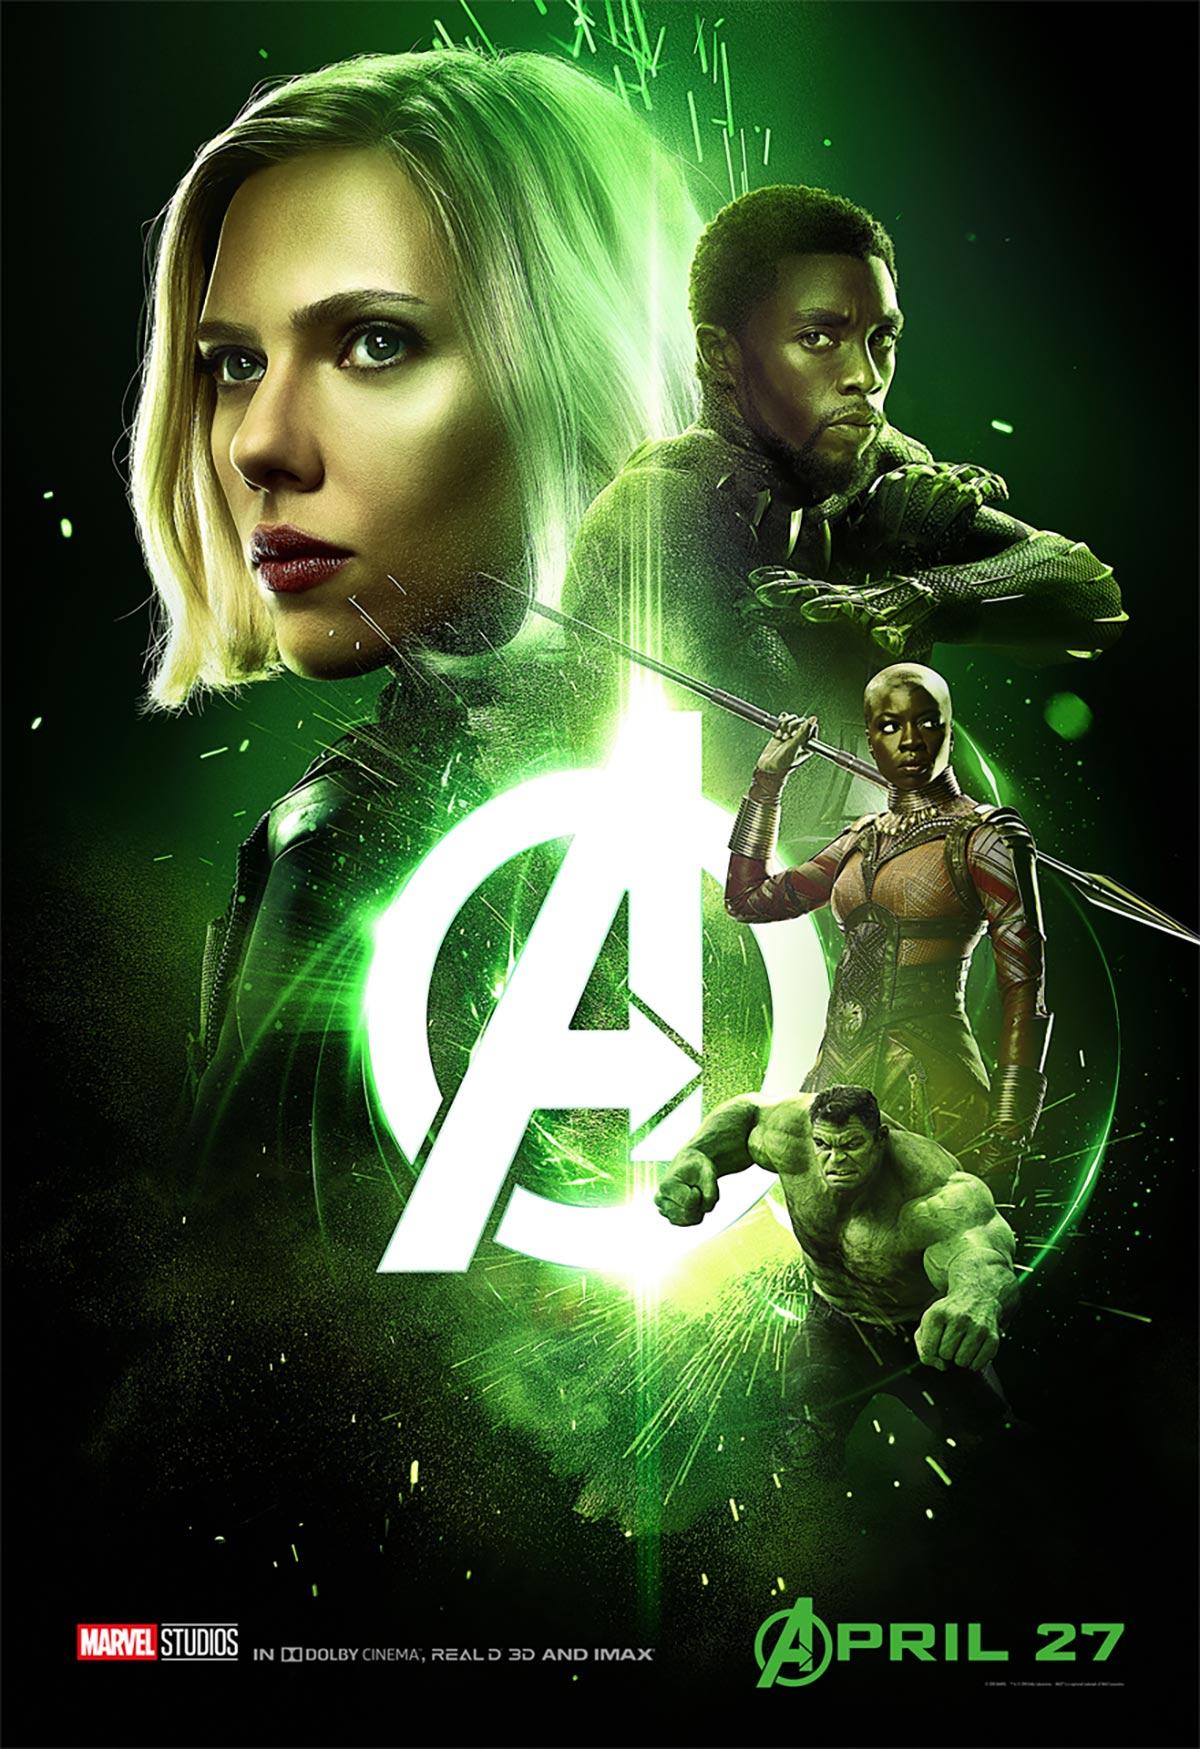 Avengers: Infinity War Poster #4